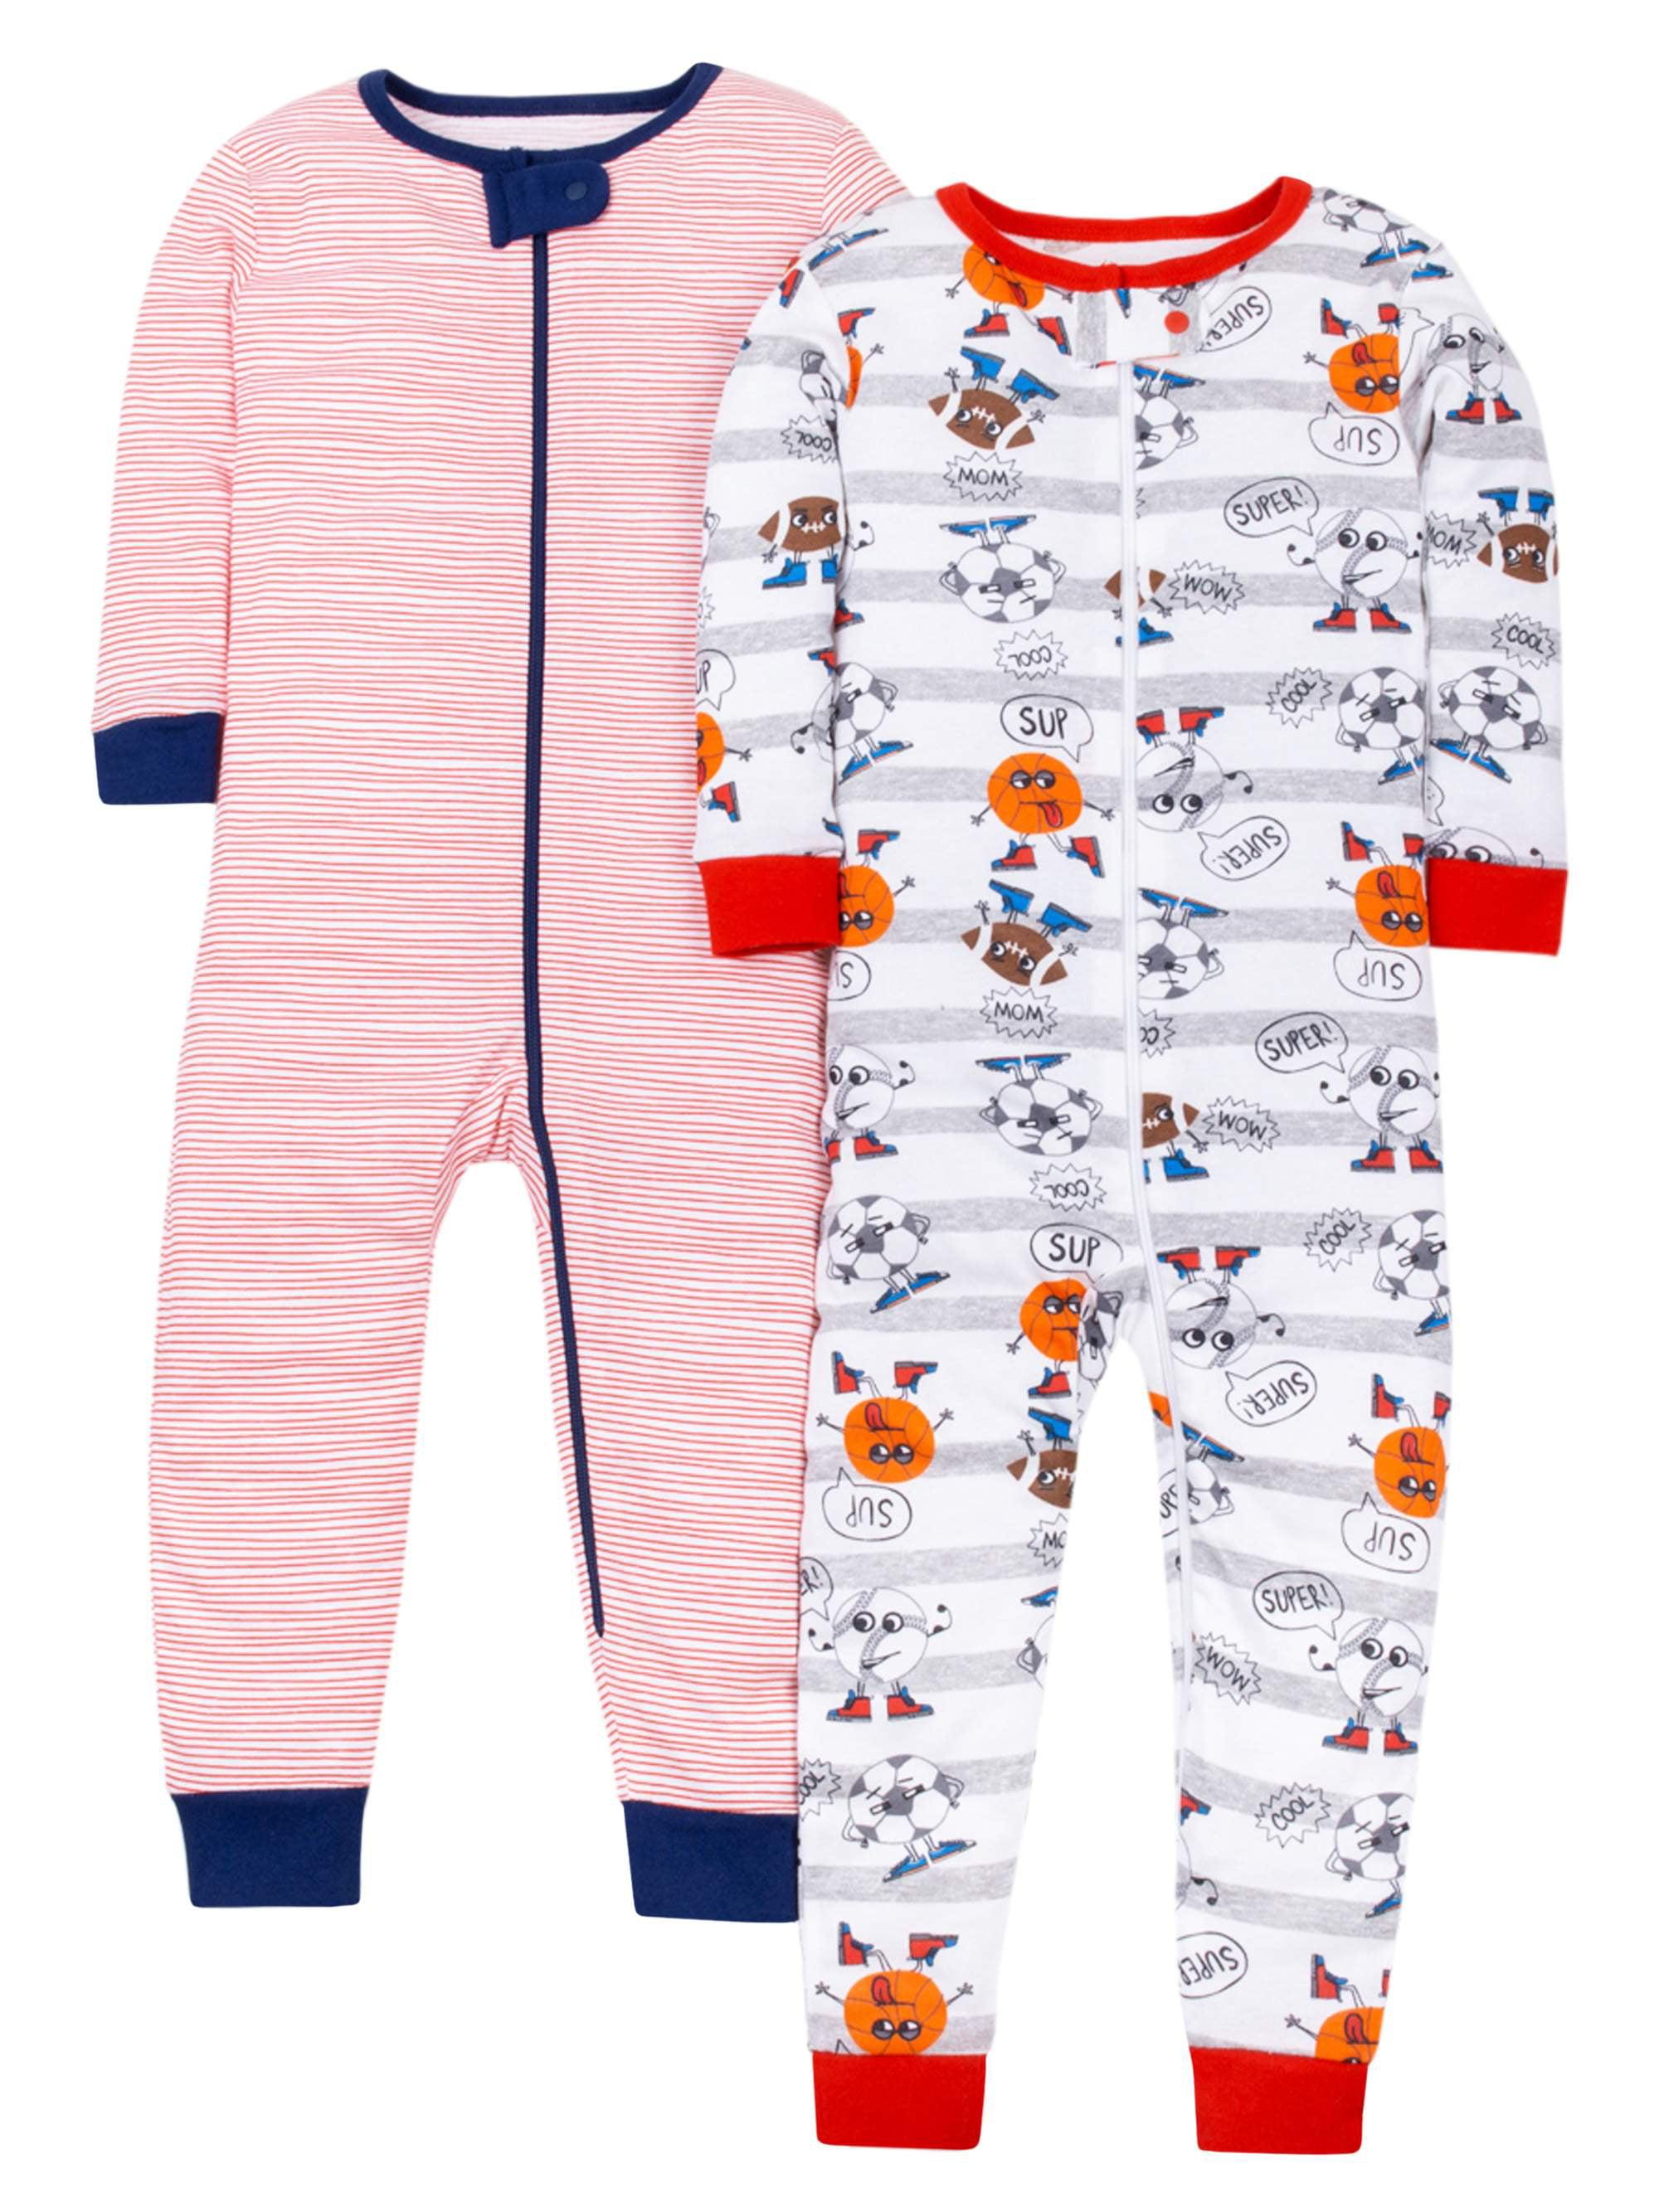 100% Organic Cotton Footless Stretchies Pajamas, 2-pack (Baby Boys & Toddler Boys)